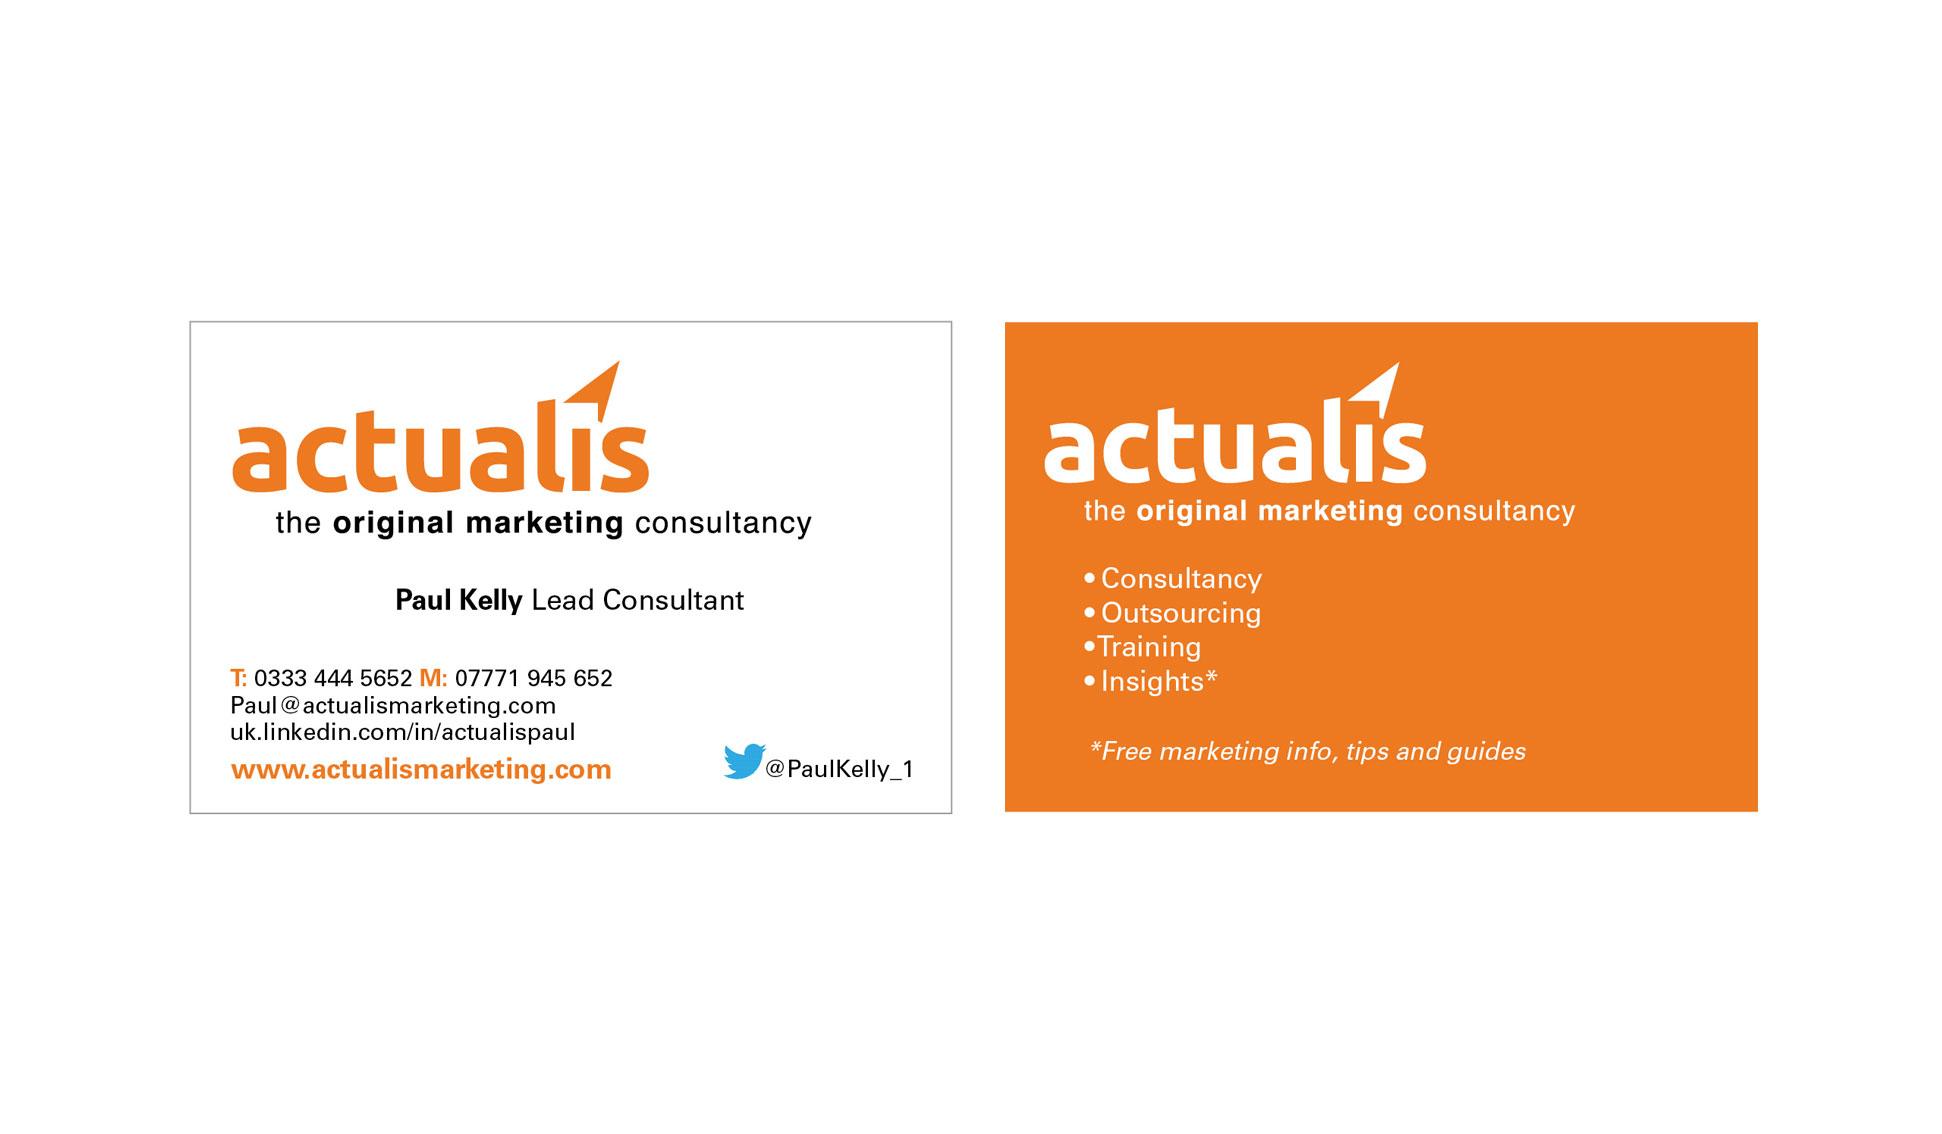 actualis_cards